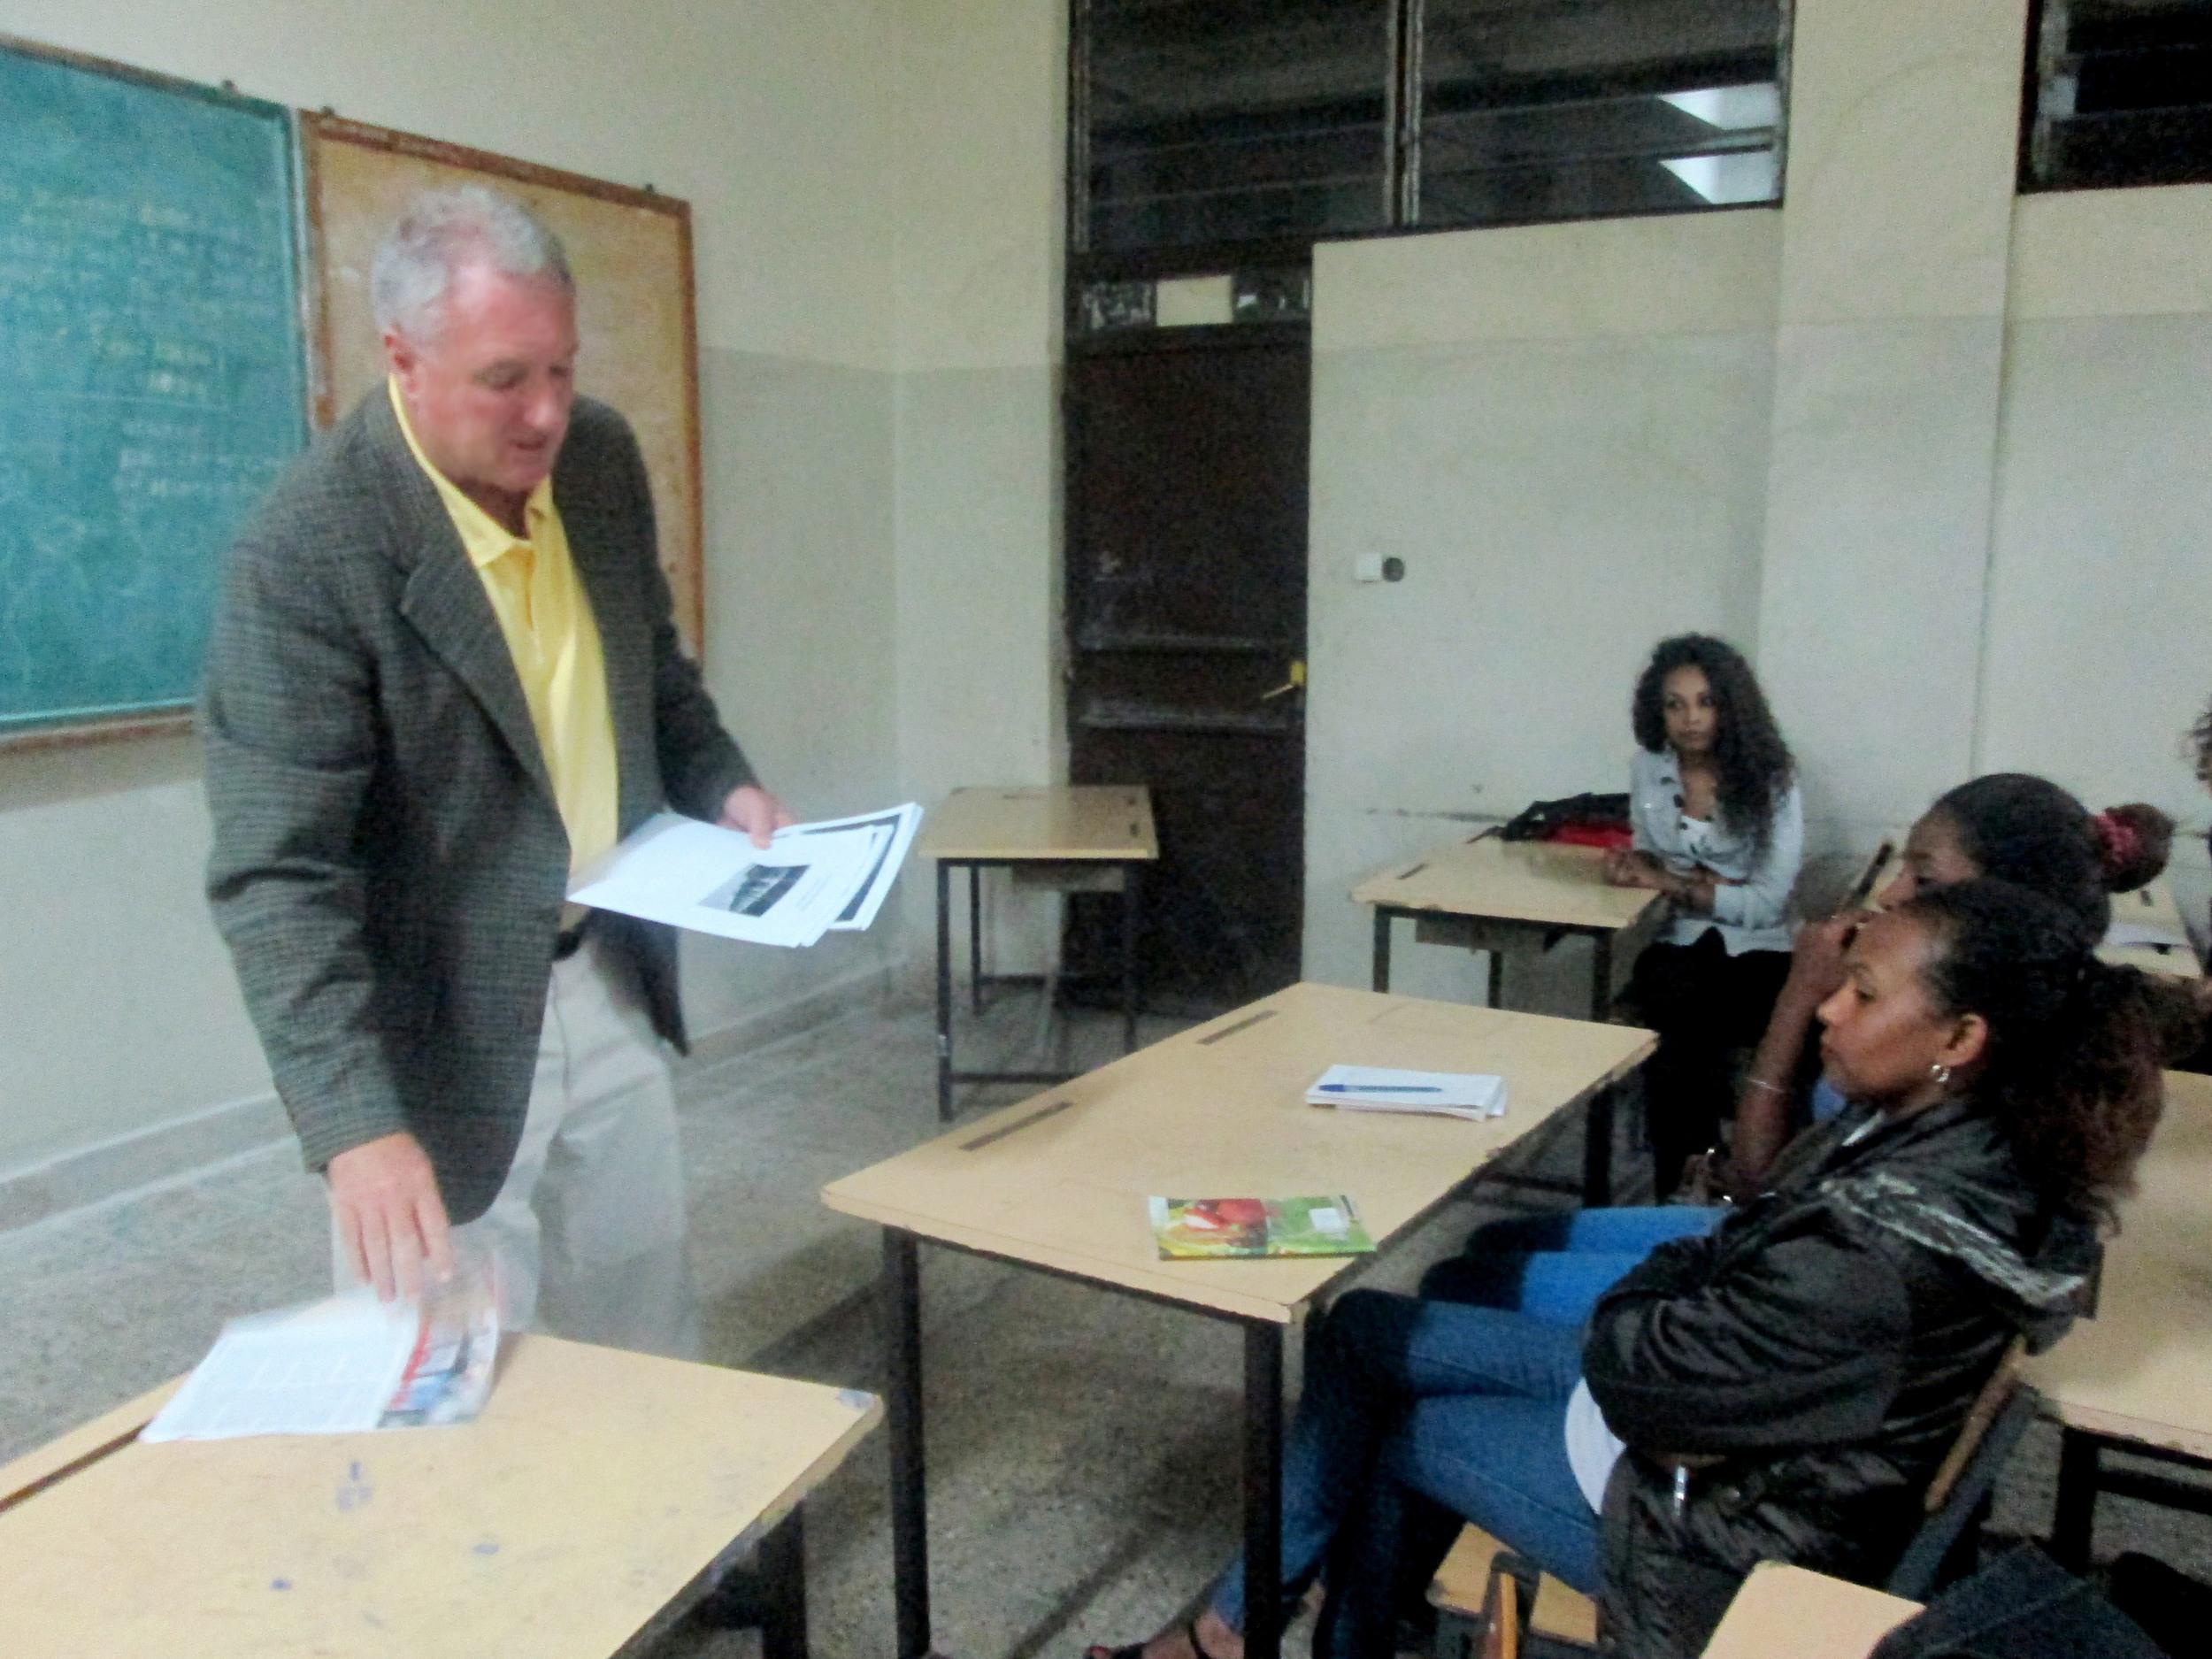 PJB III TEACHING AT UNIVERSITY